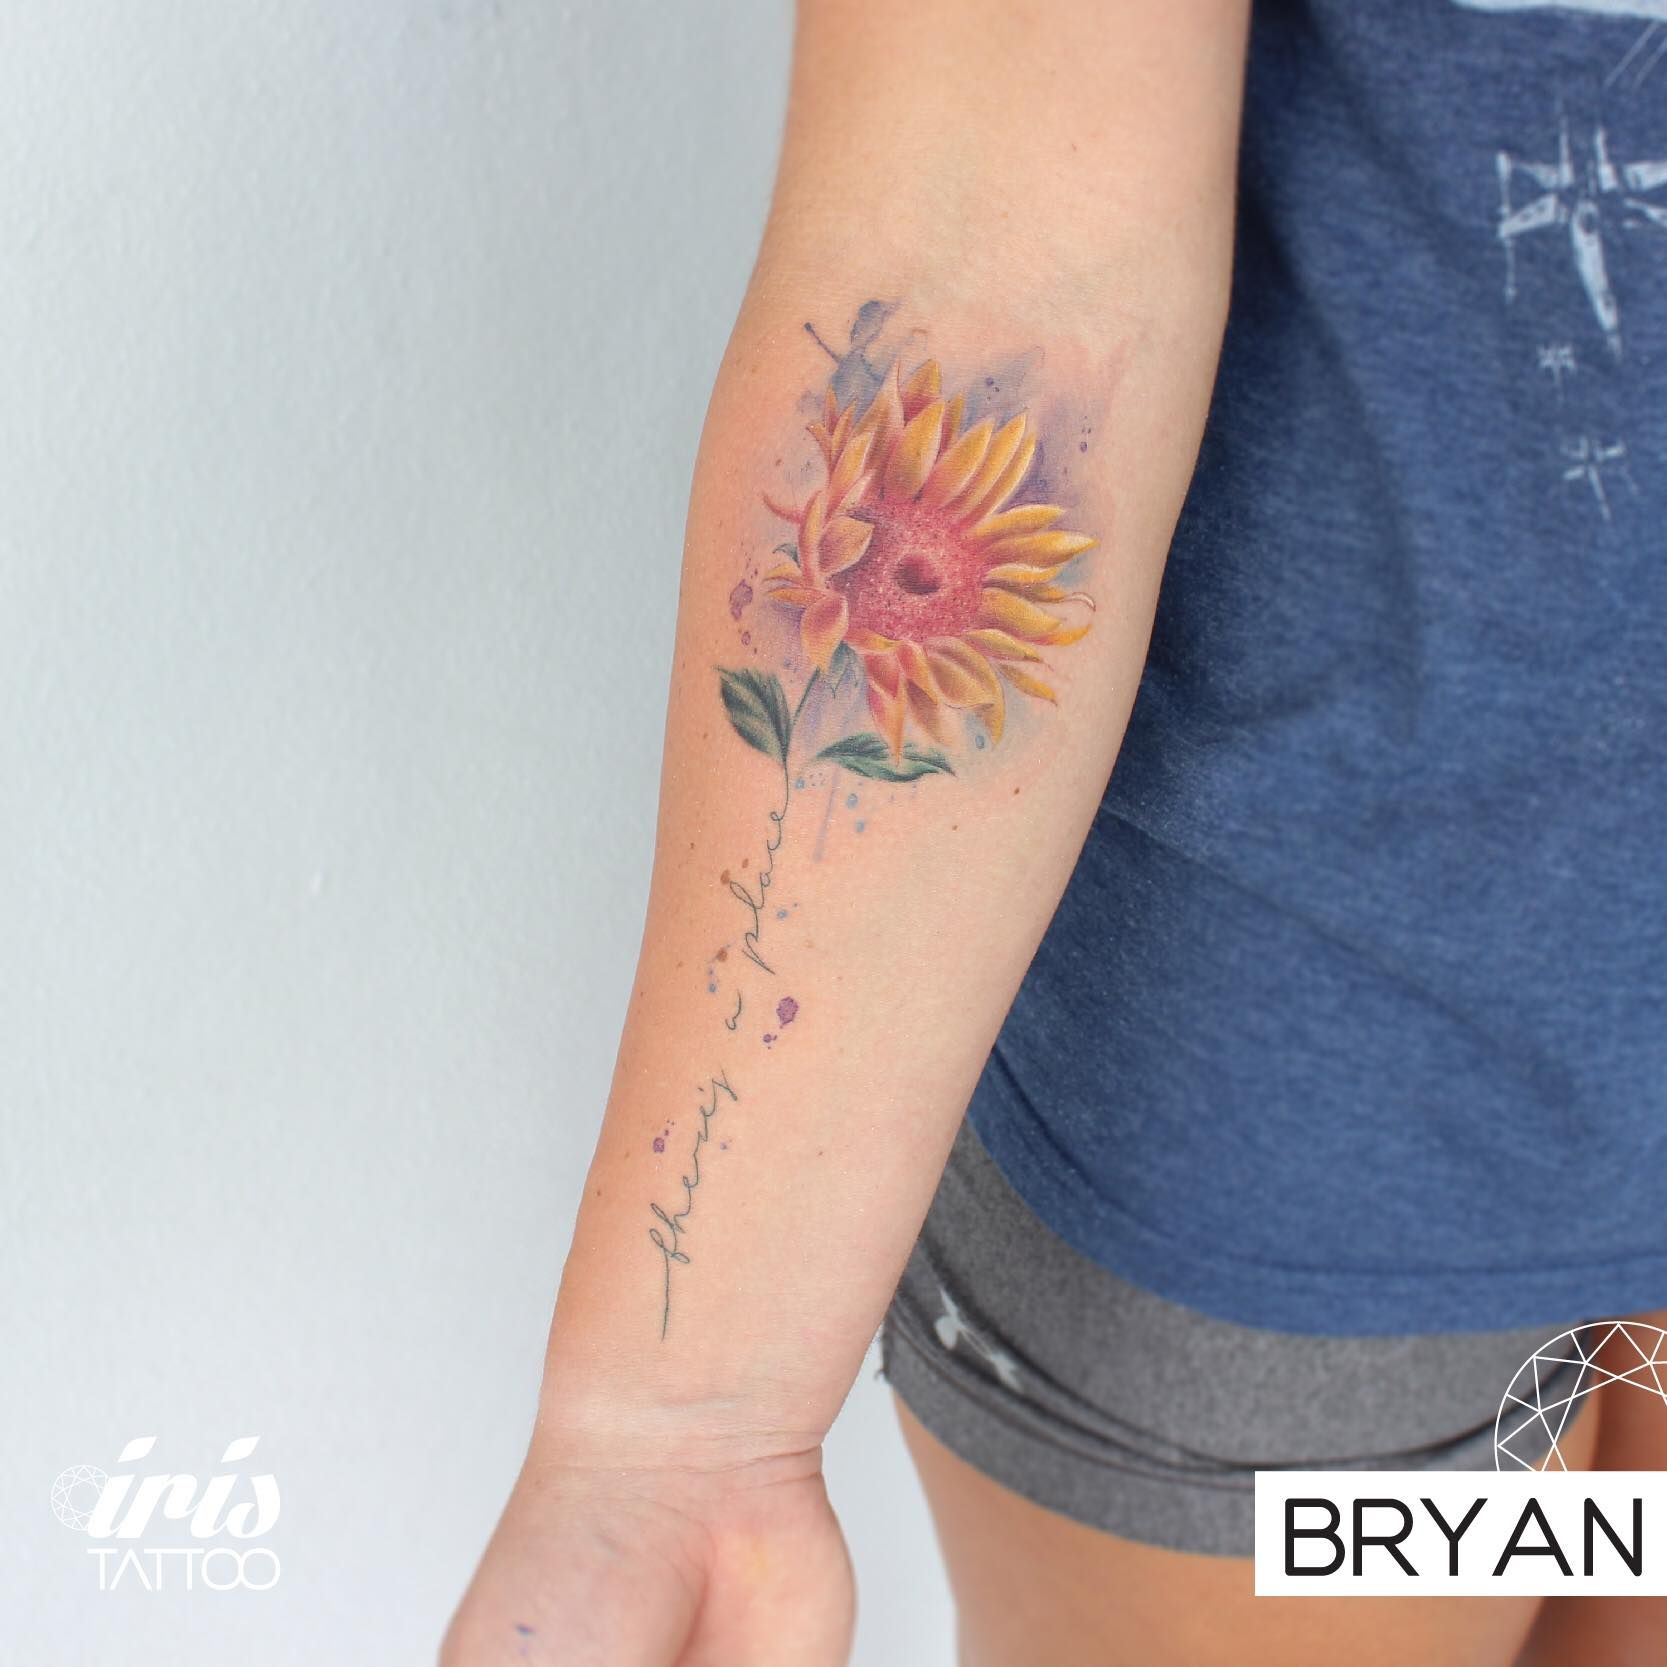 Pin by christine fowler on tattoo tattoos life tattoos